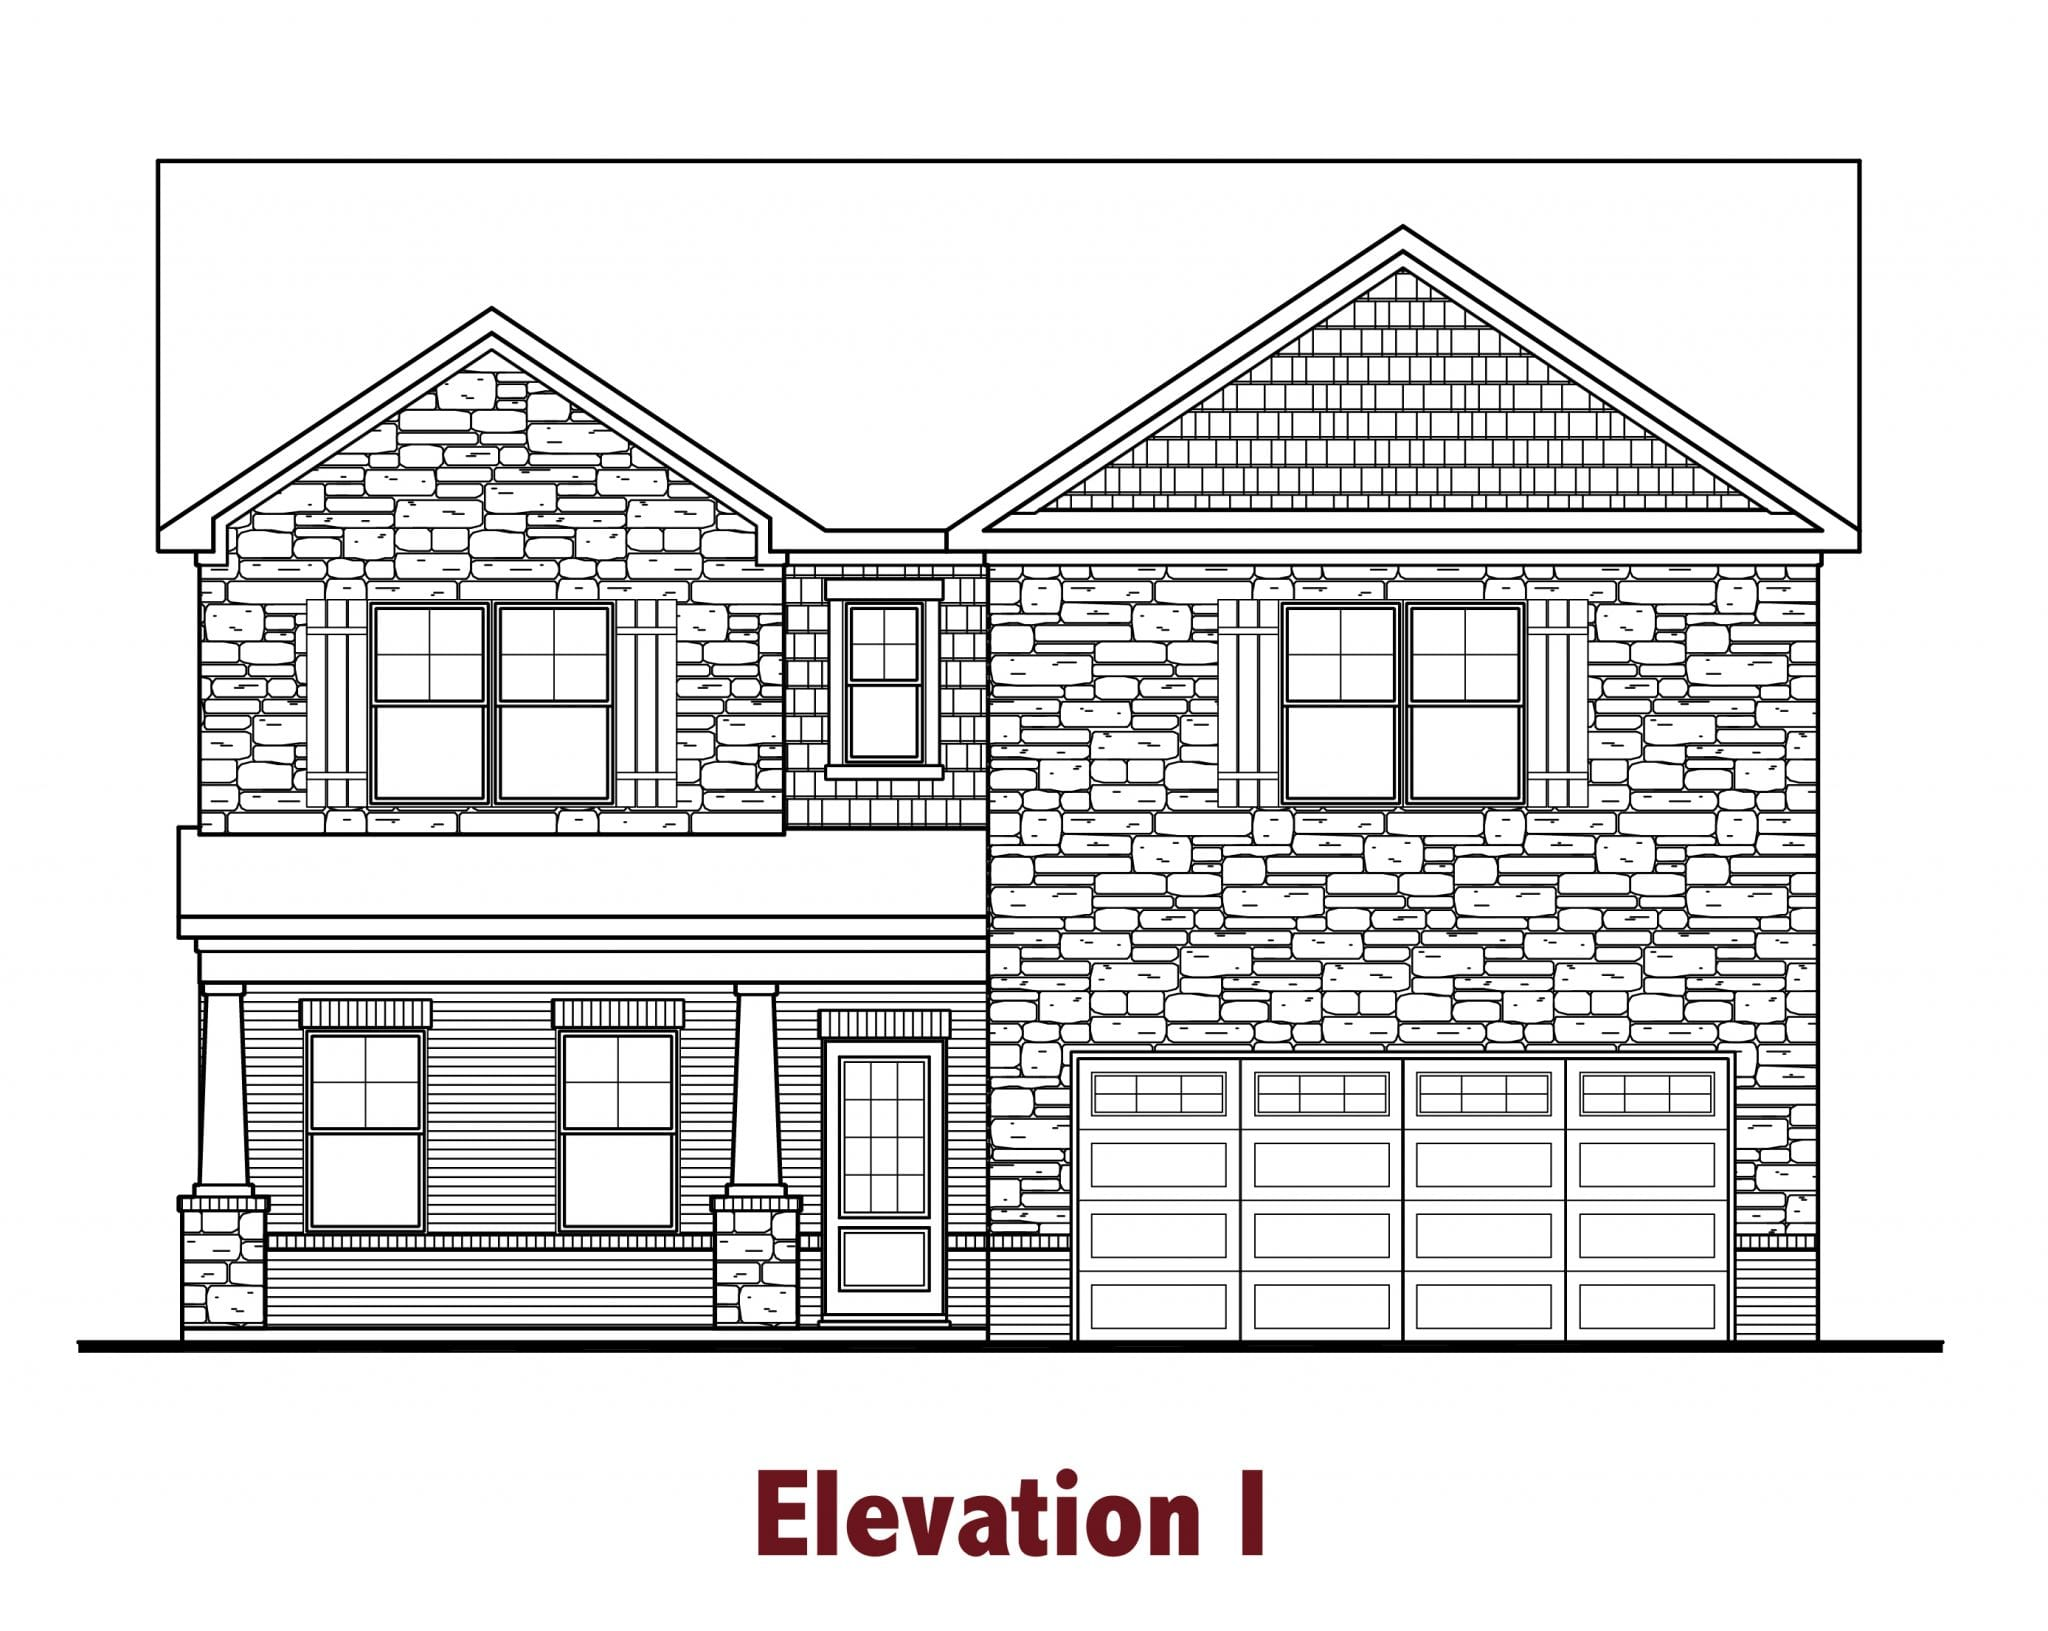 Glendale elevations Image